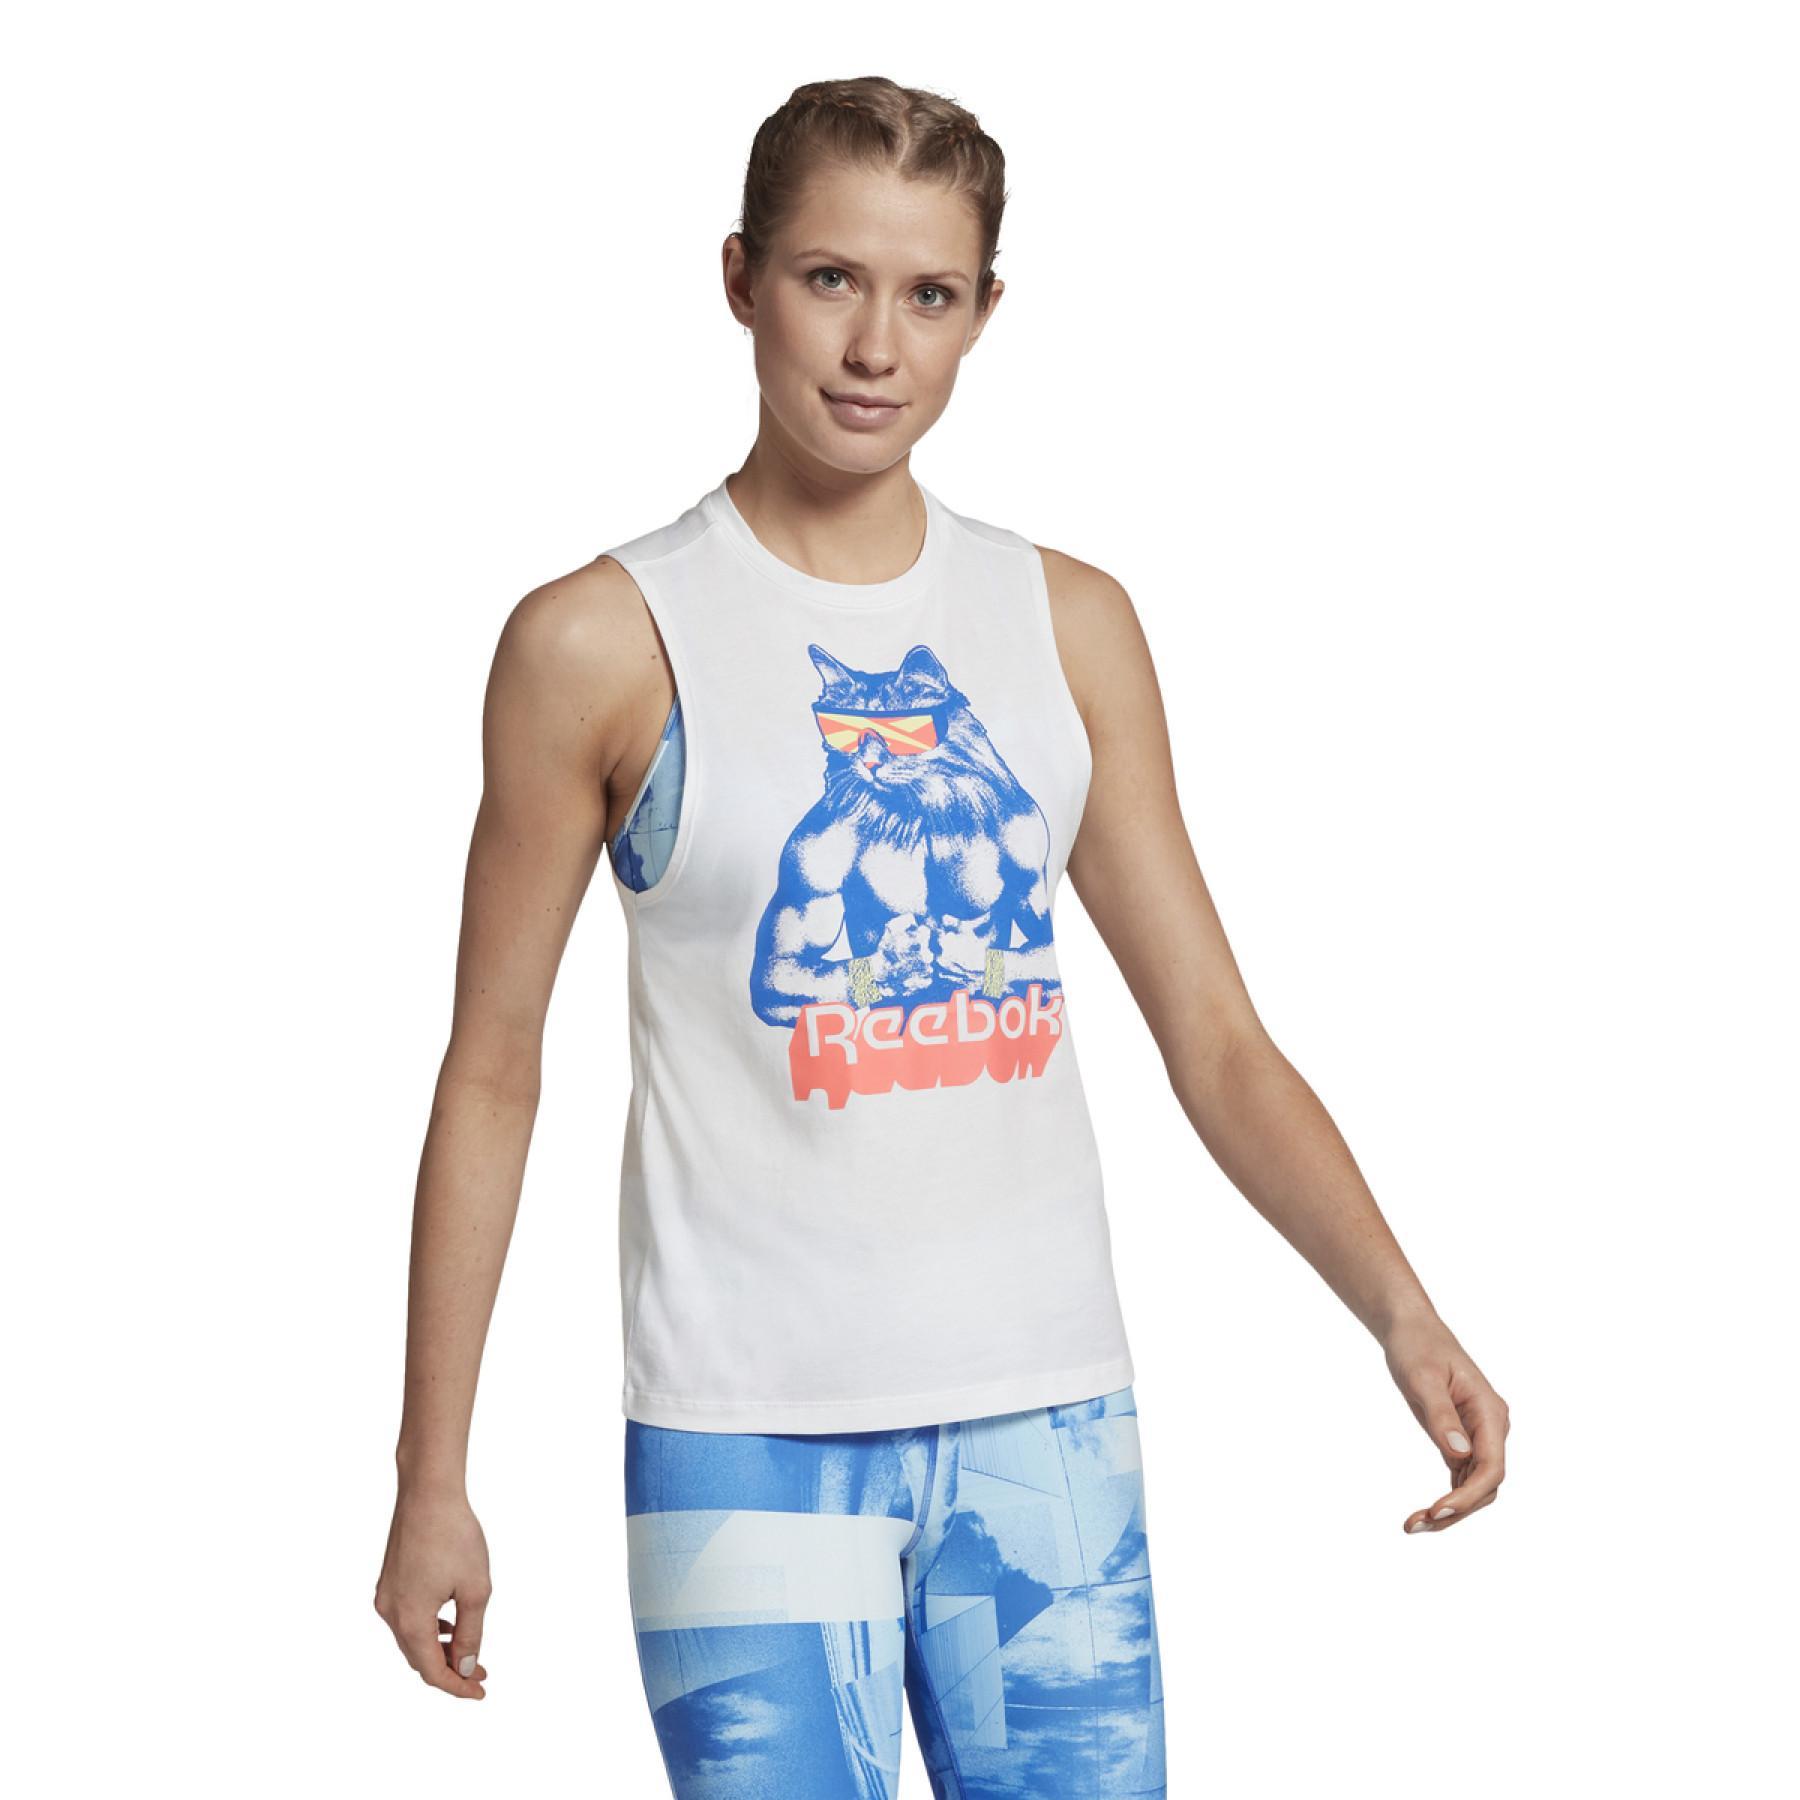 Reebok Gritty Kitty Tank Top woman's T-shirt